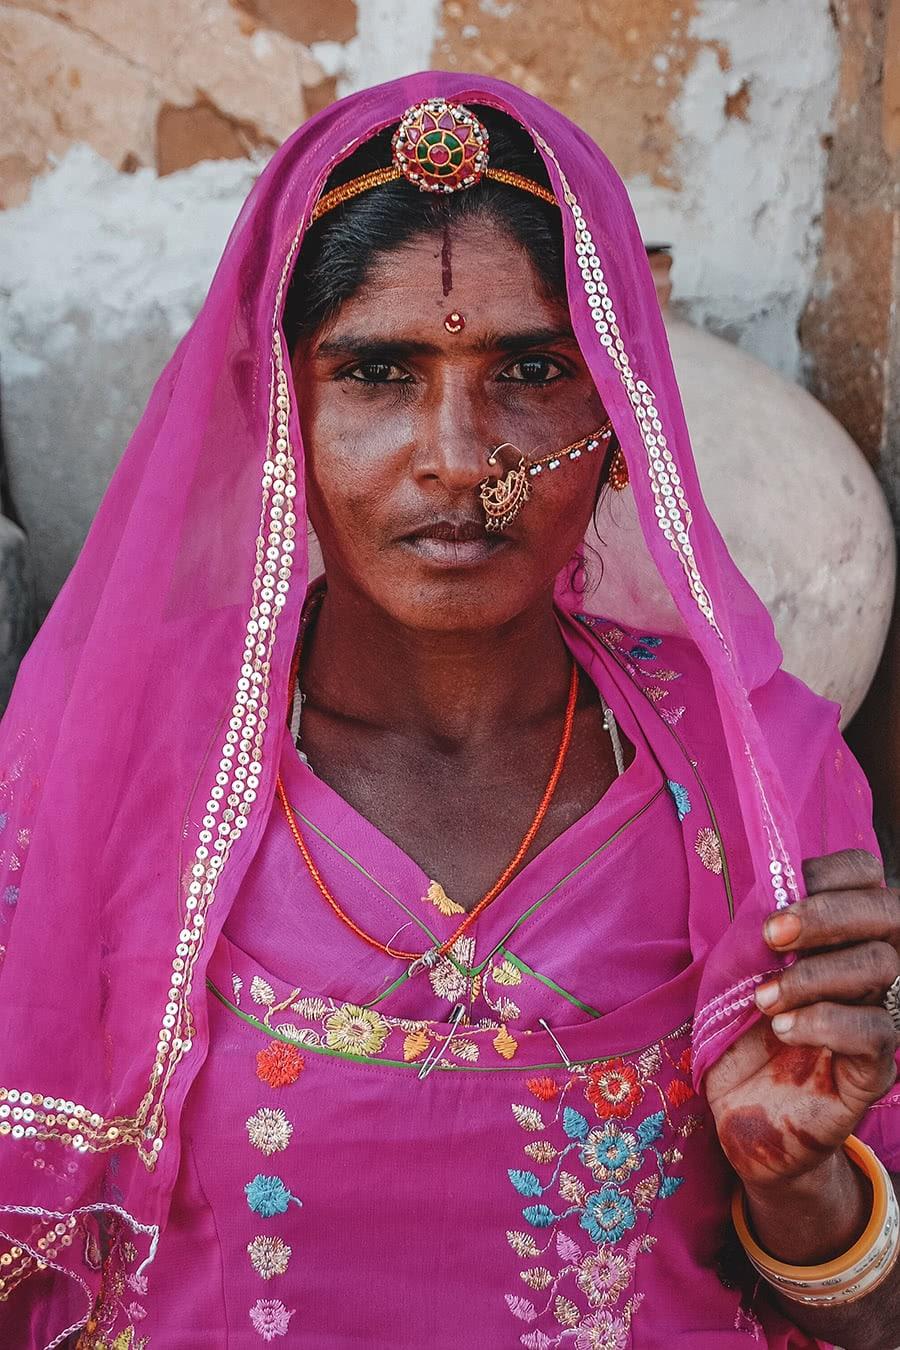 Rajput woman living in the Thar Desert, near Jaisalmer, India.